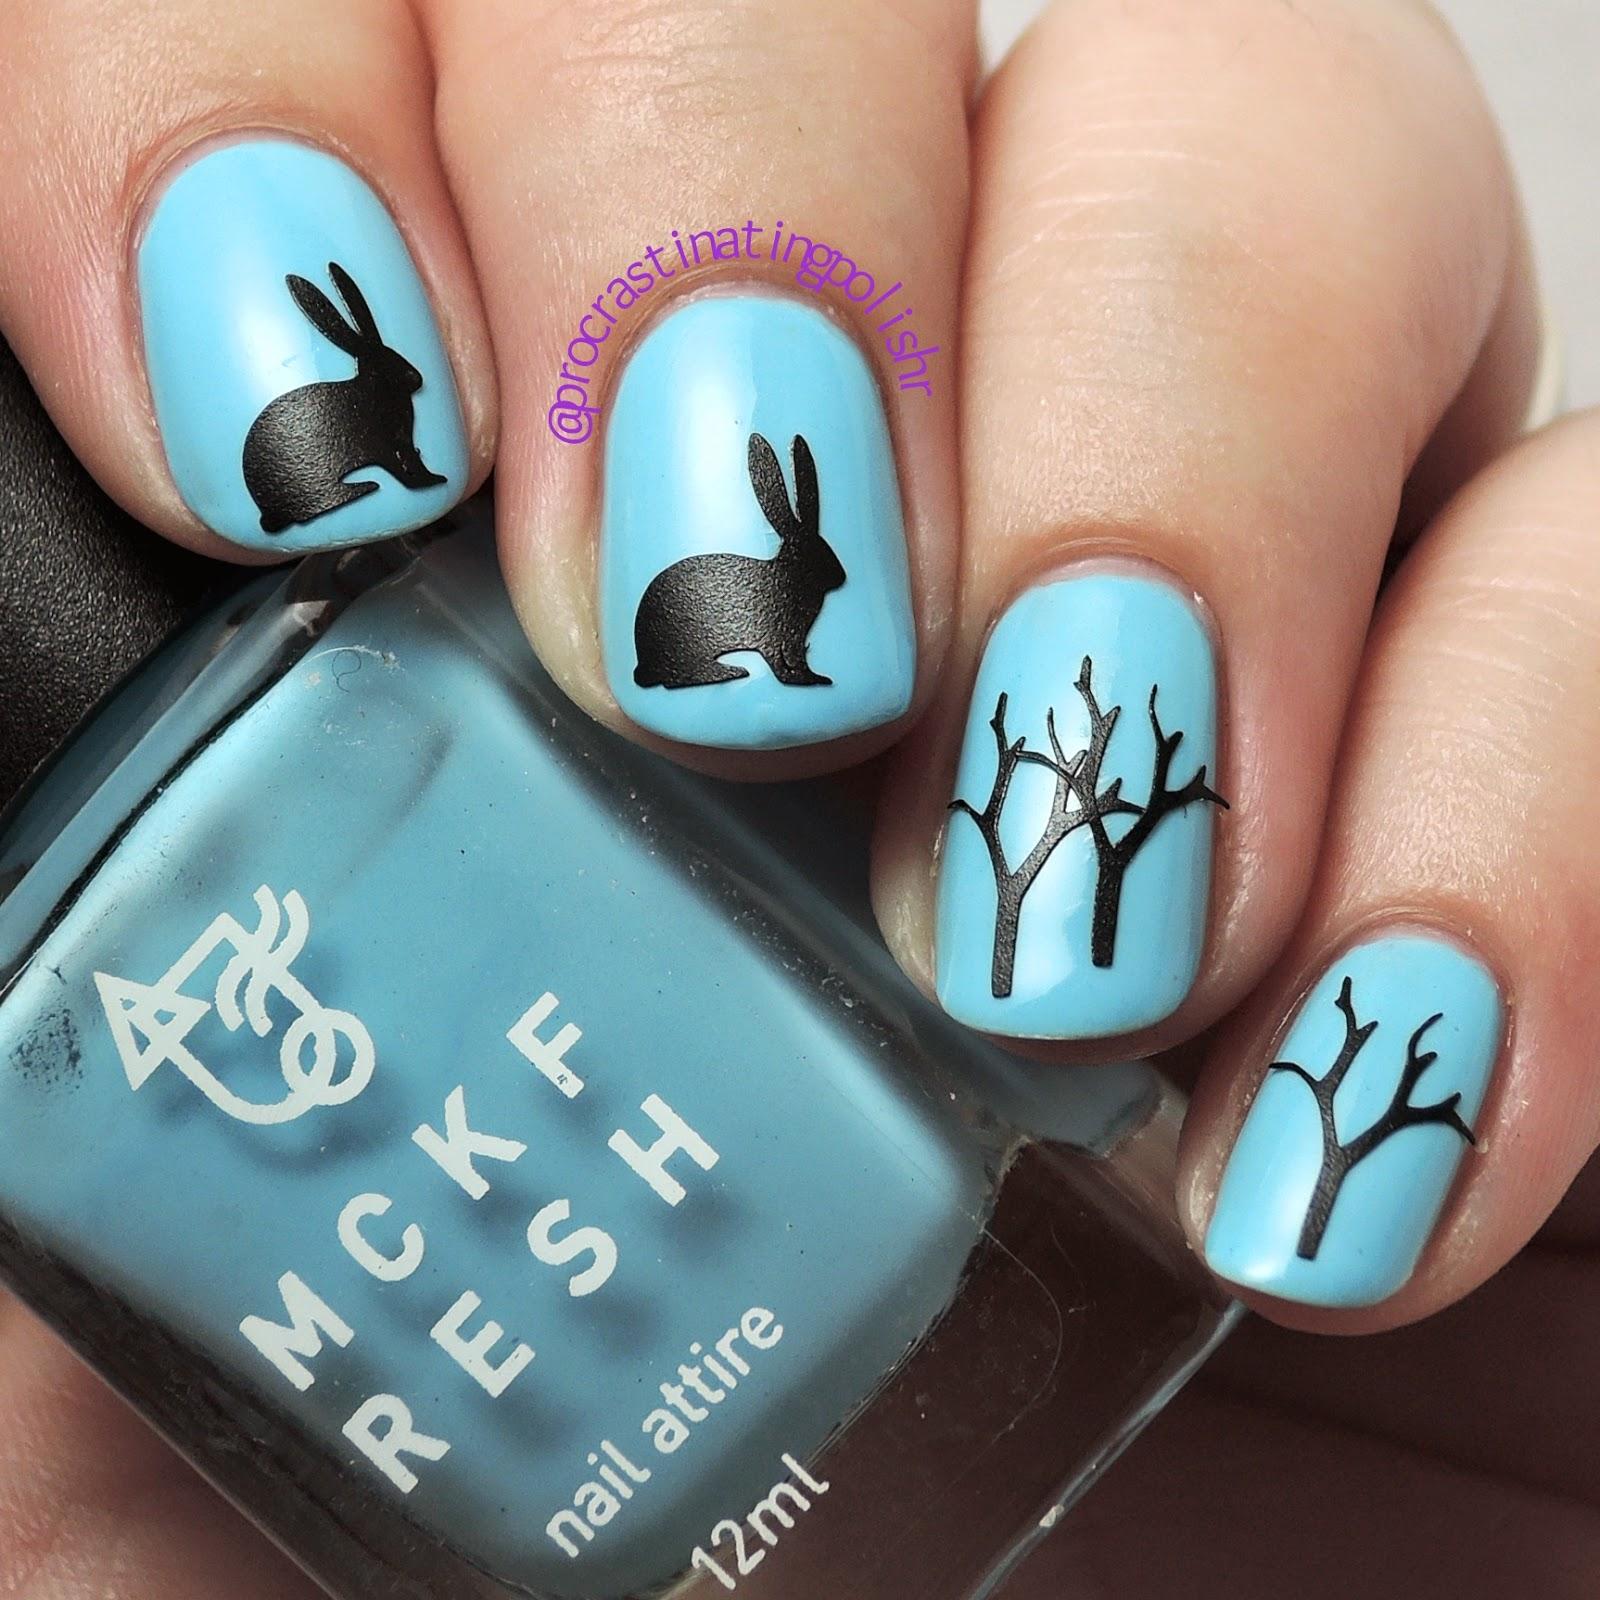 Mckfresh nail decals - rabbit and tree over Azure Mist